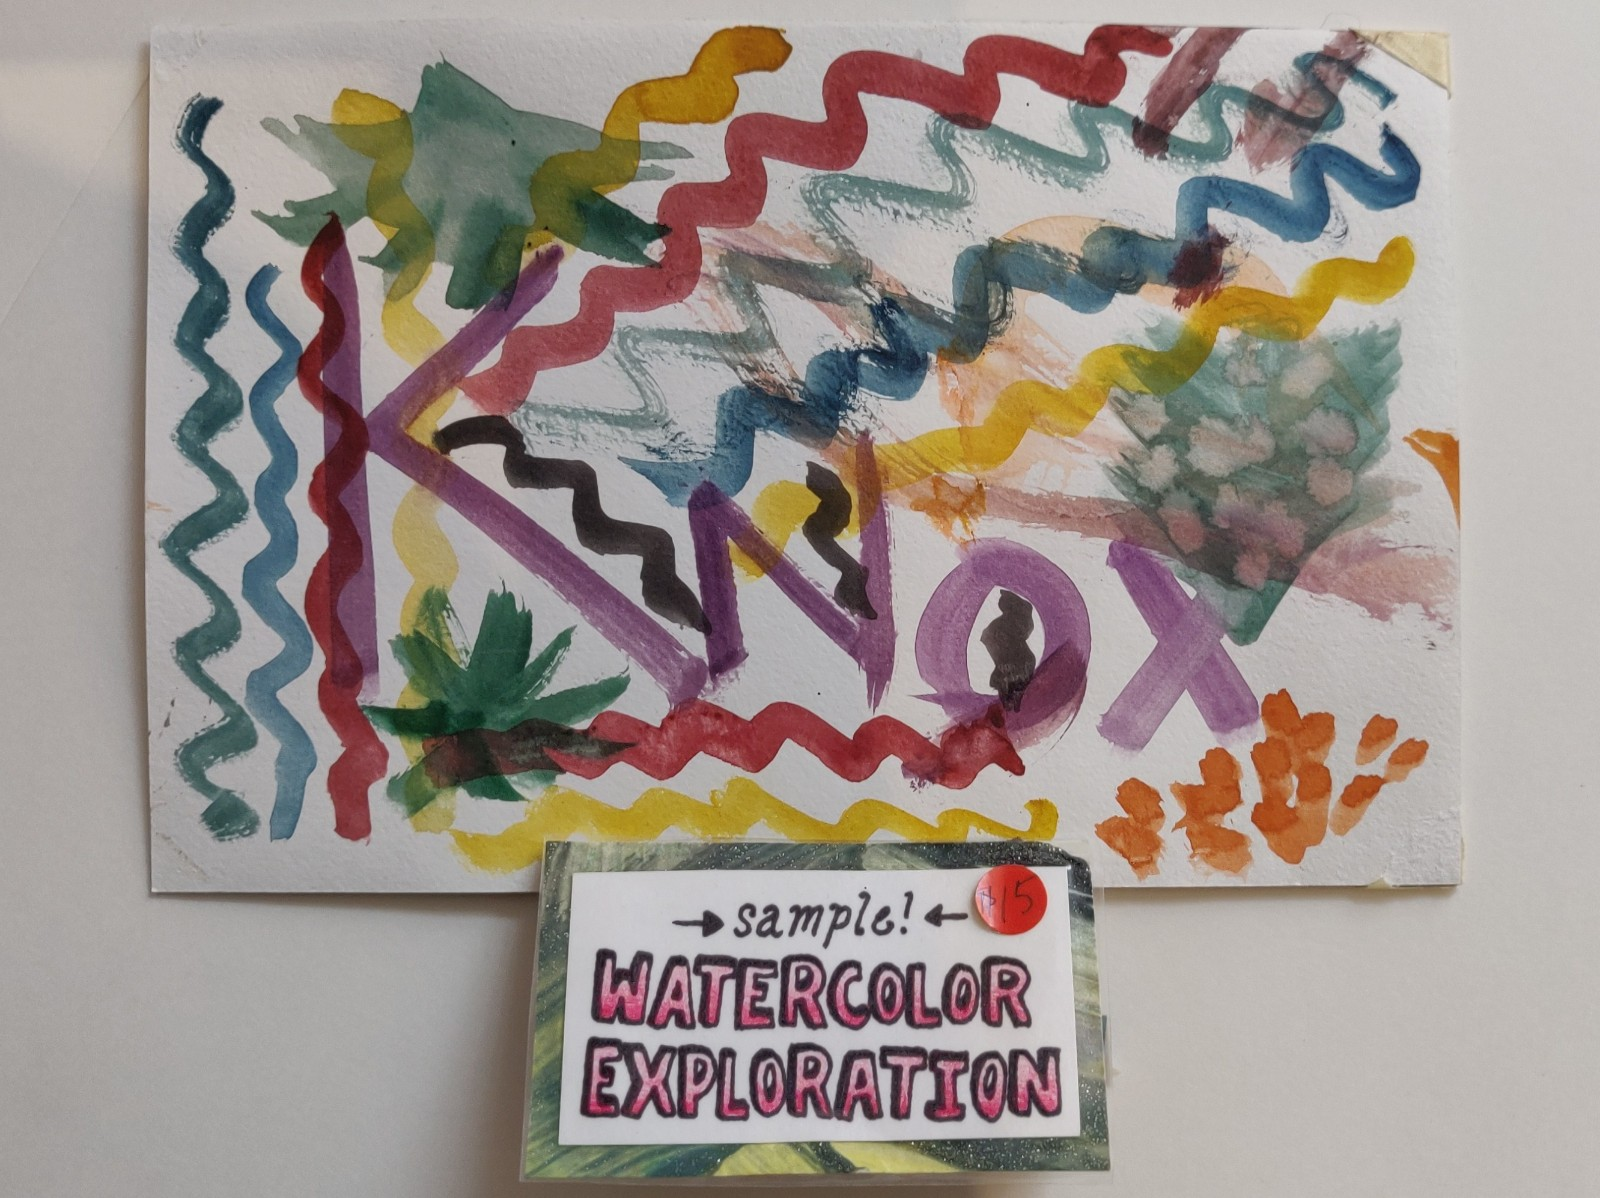 Watercolor Exploration